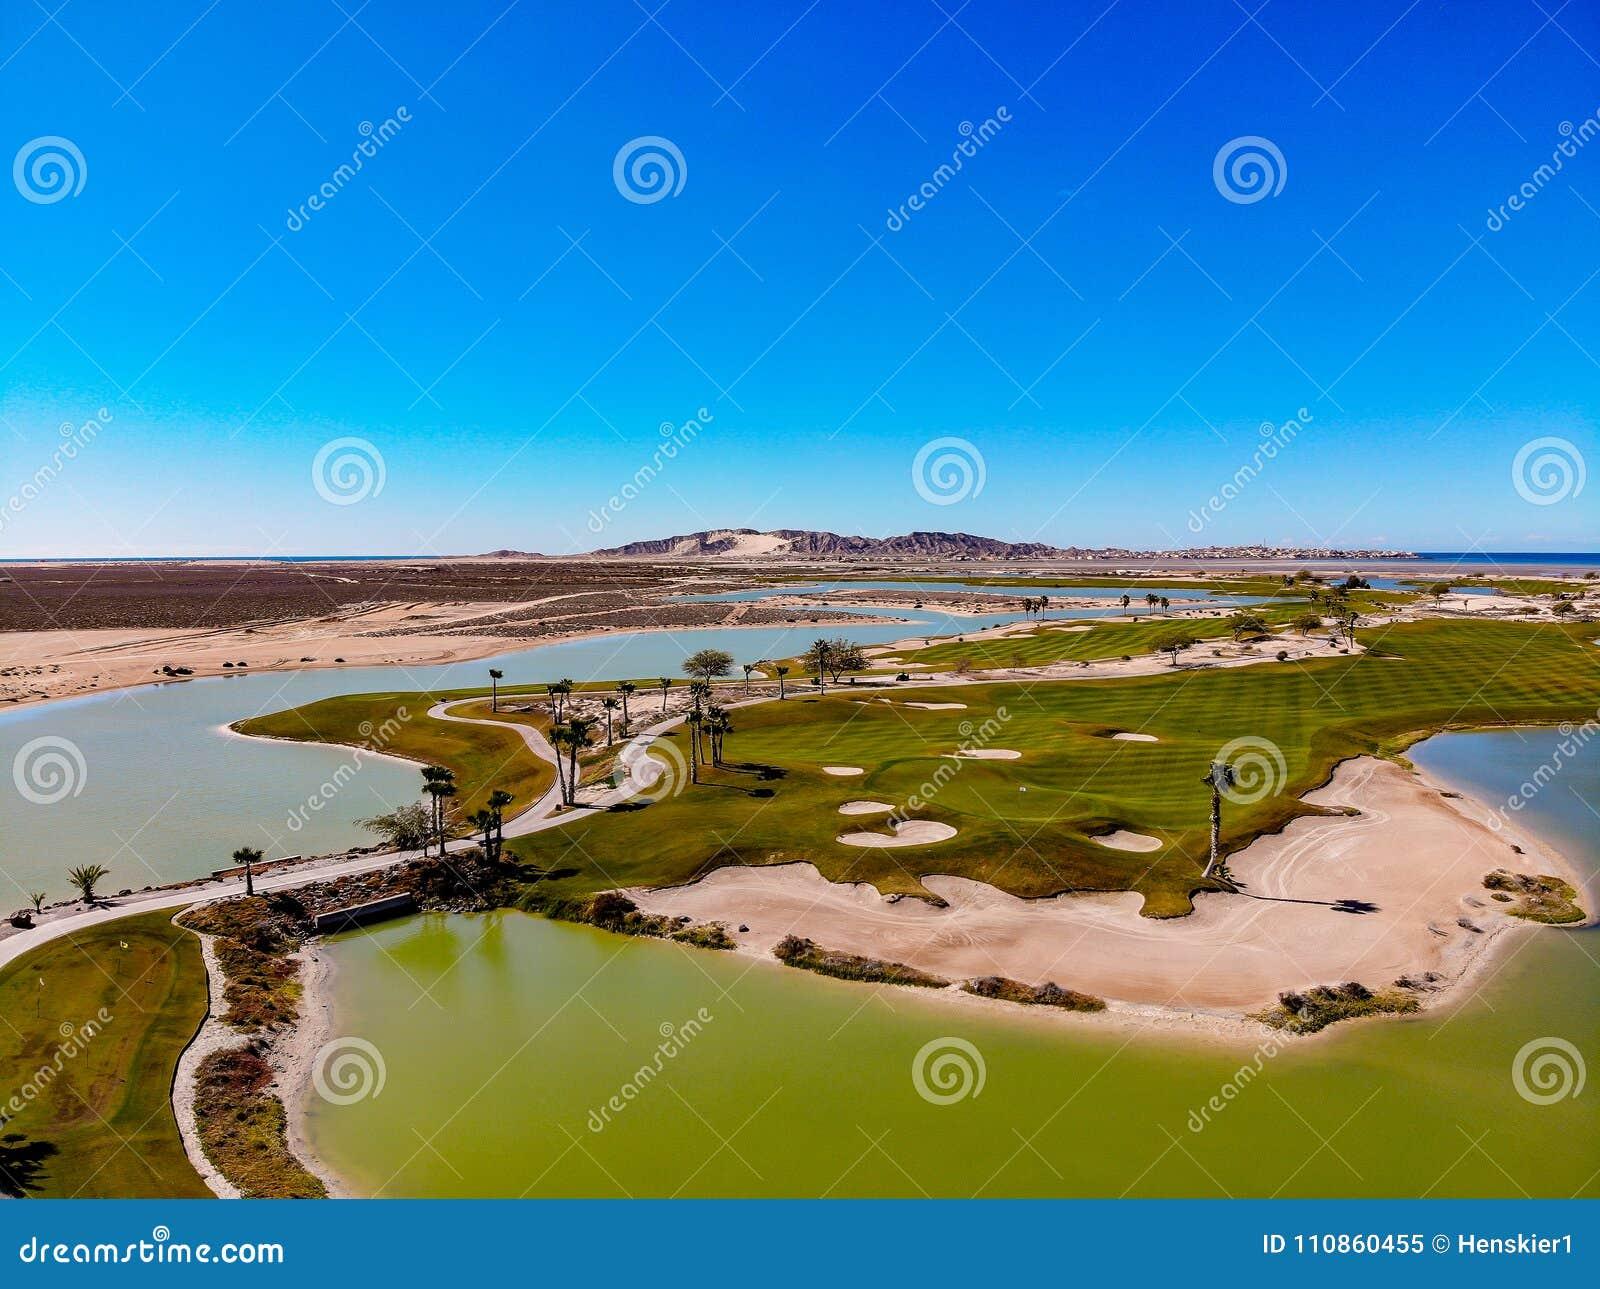 View Of Nicklaus Designed Islas Del Mar Golf Course Editorial Image